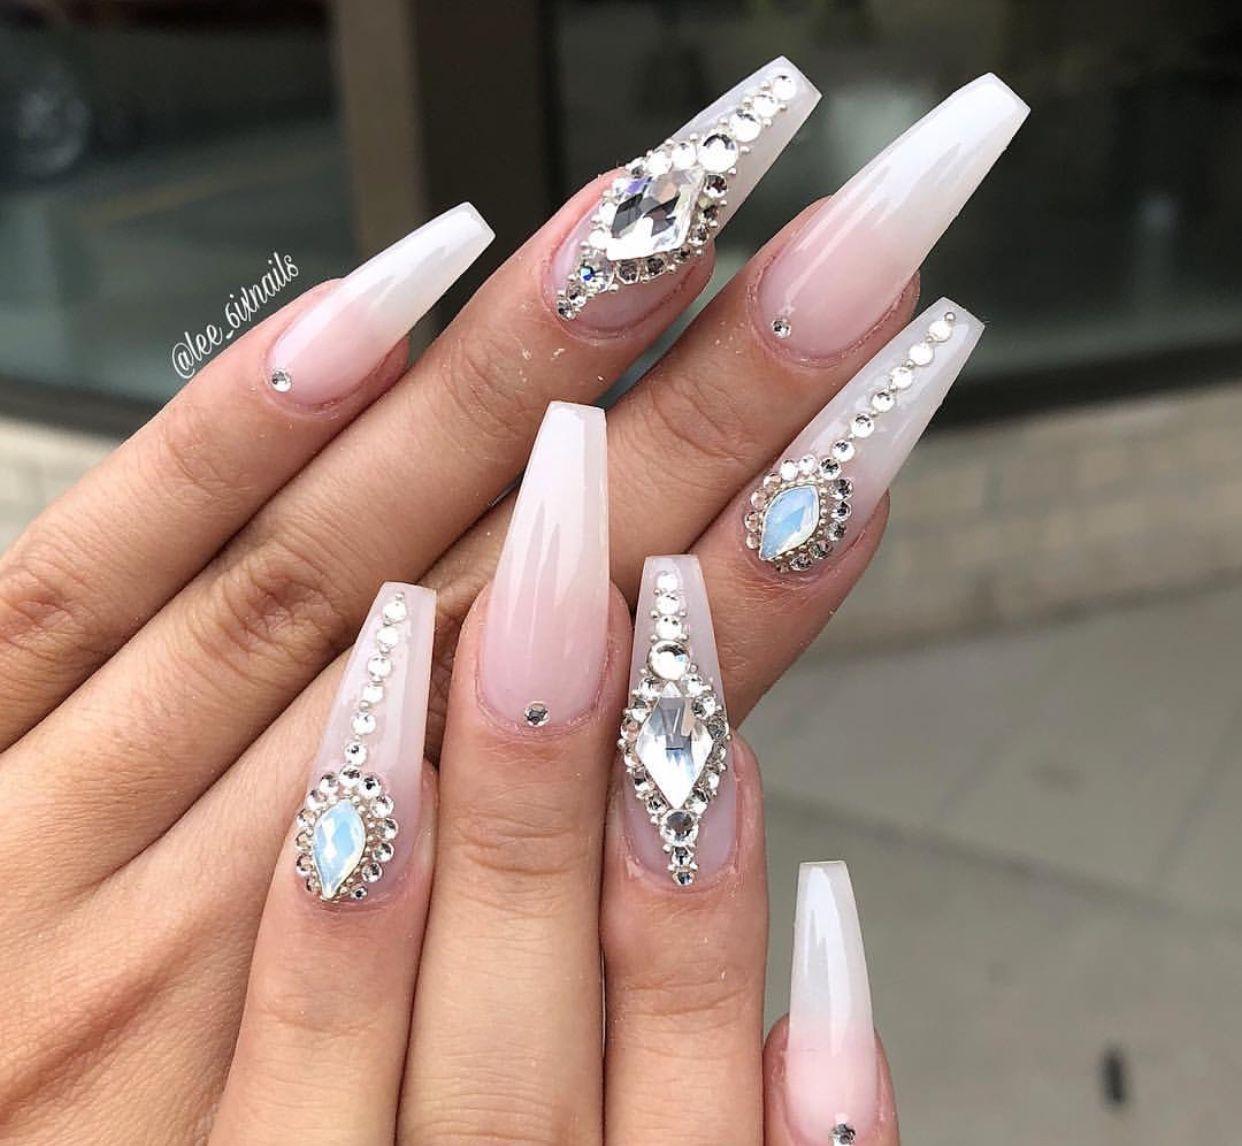 Pin By S A N T A N A On Acrylic Nails Diamond Nails White Diamond Nails Nails Design With Rhinestones